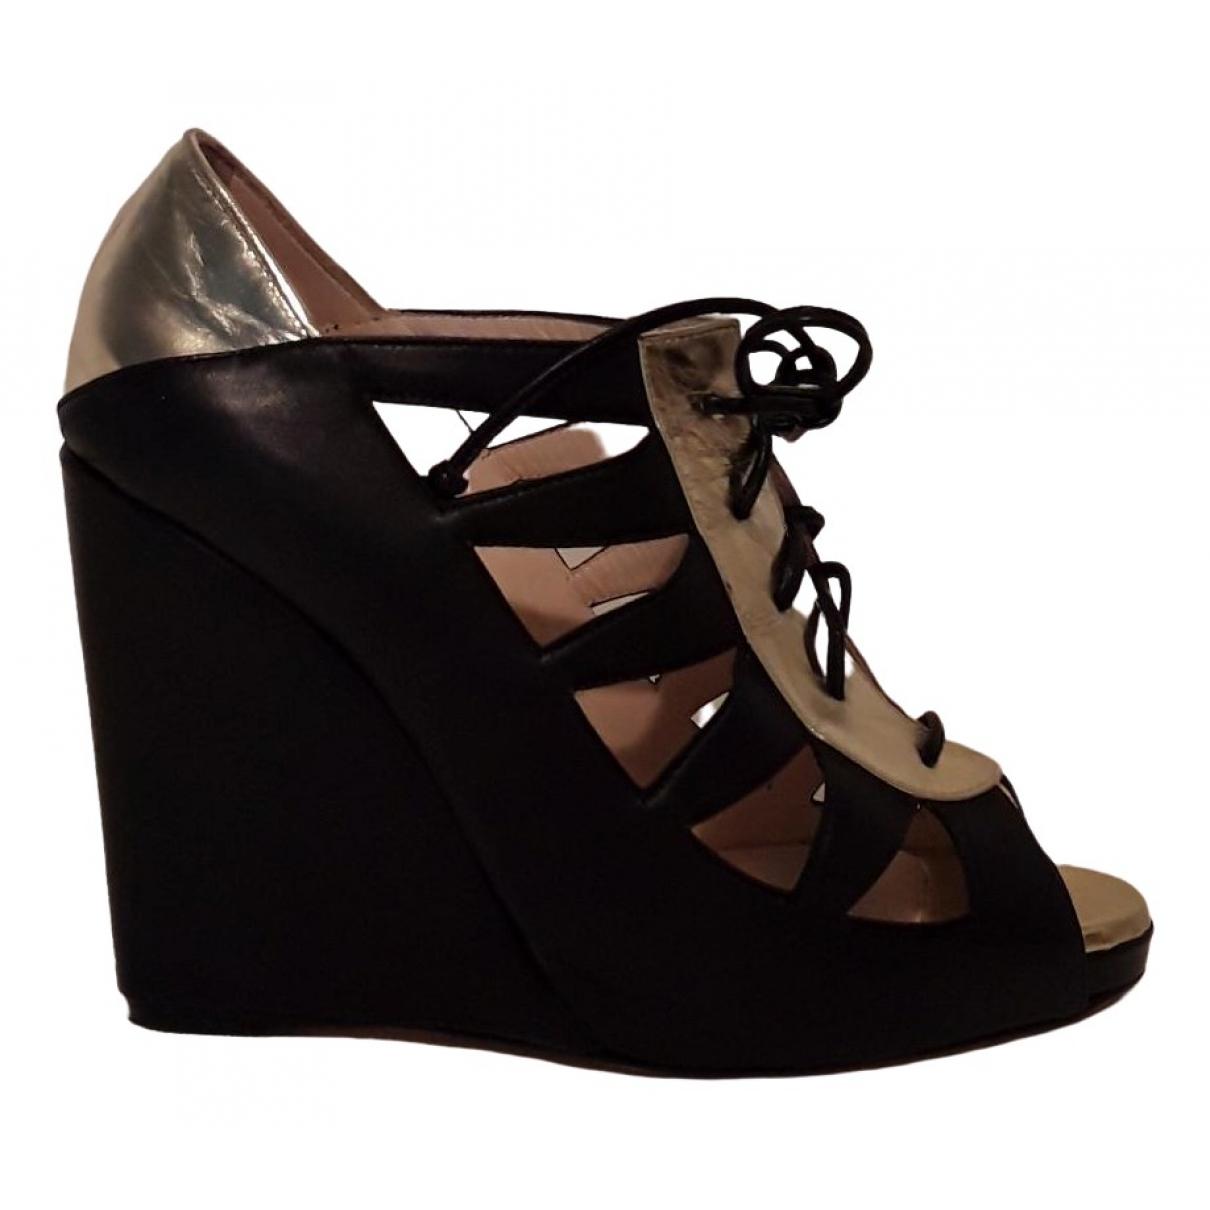 Hôtel Particulier \N Black Leather Heels for Women 39 EU